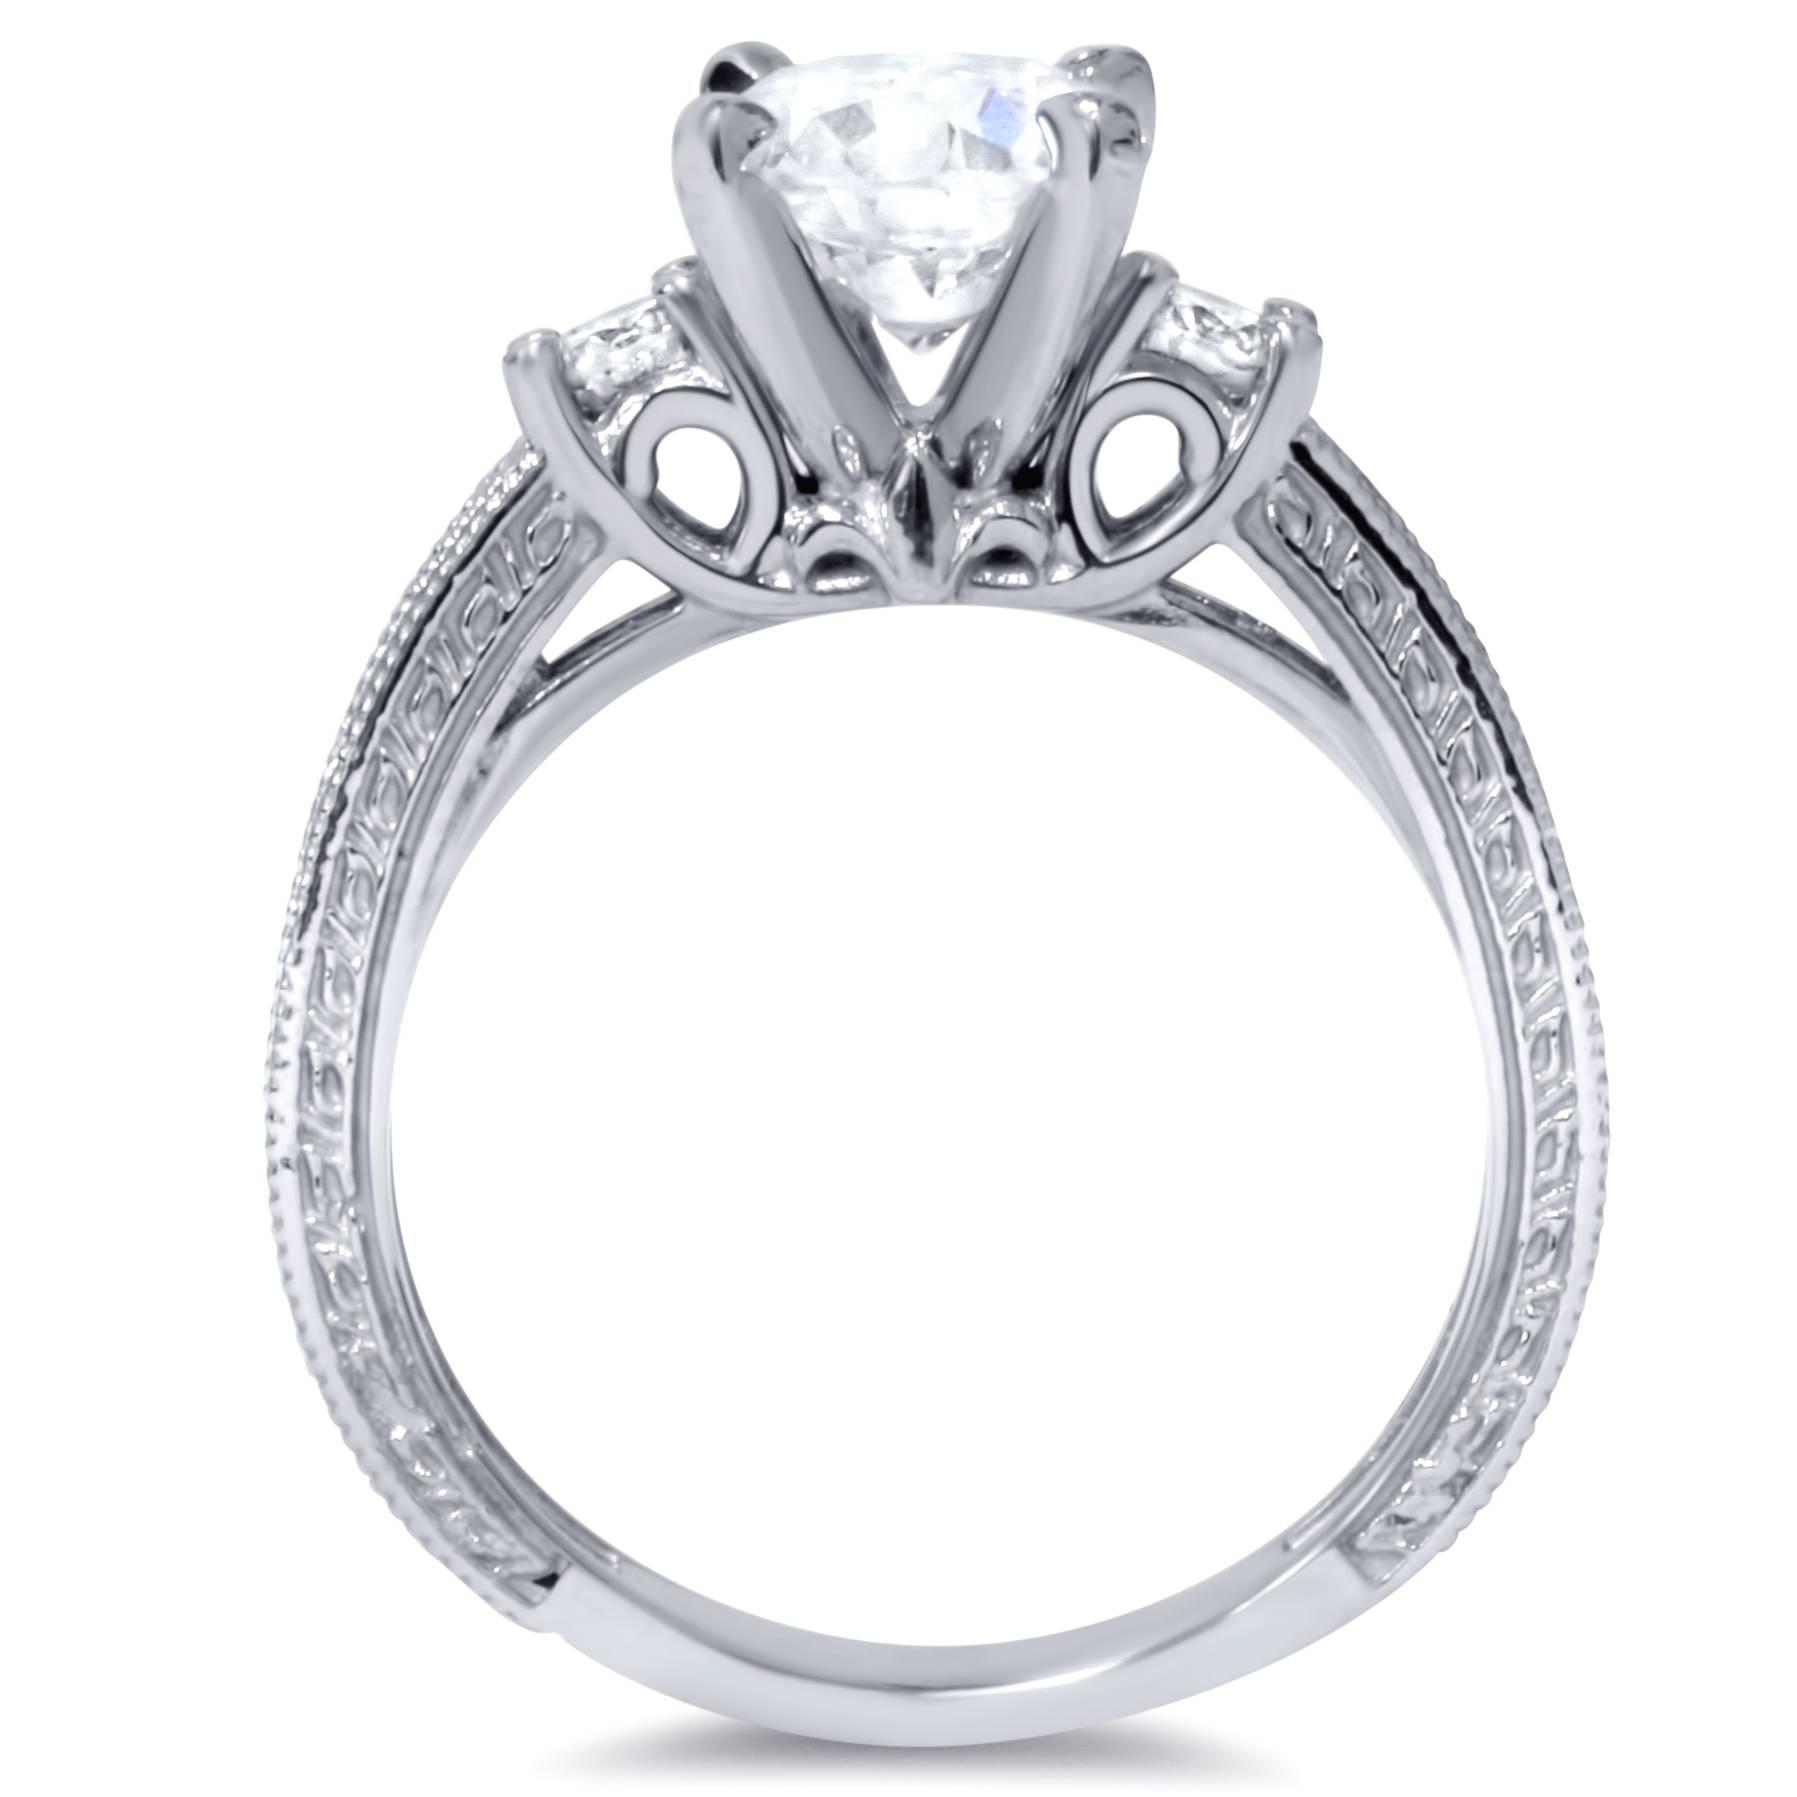 1 3 4ct Vintage Diamond Engagement Ring 14K White Gold